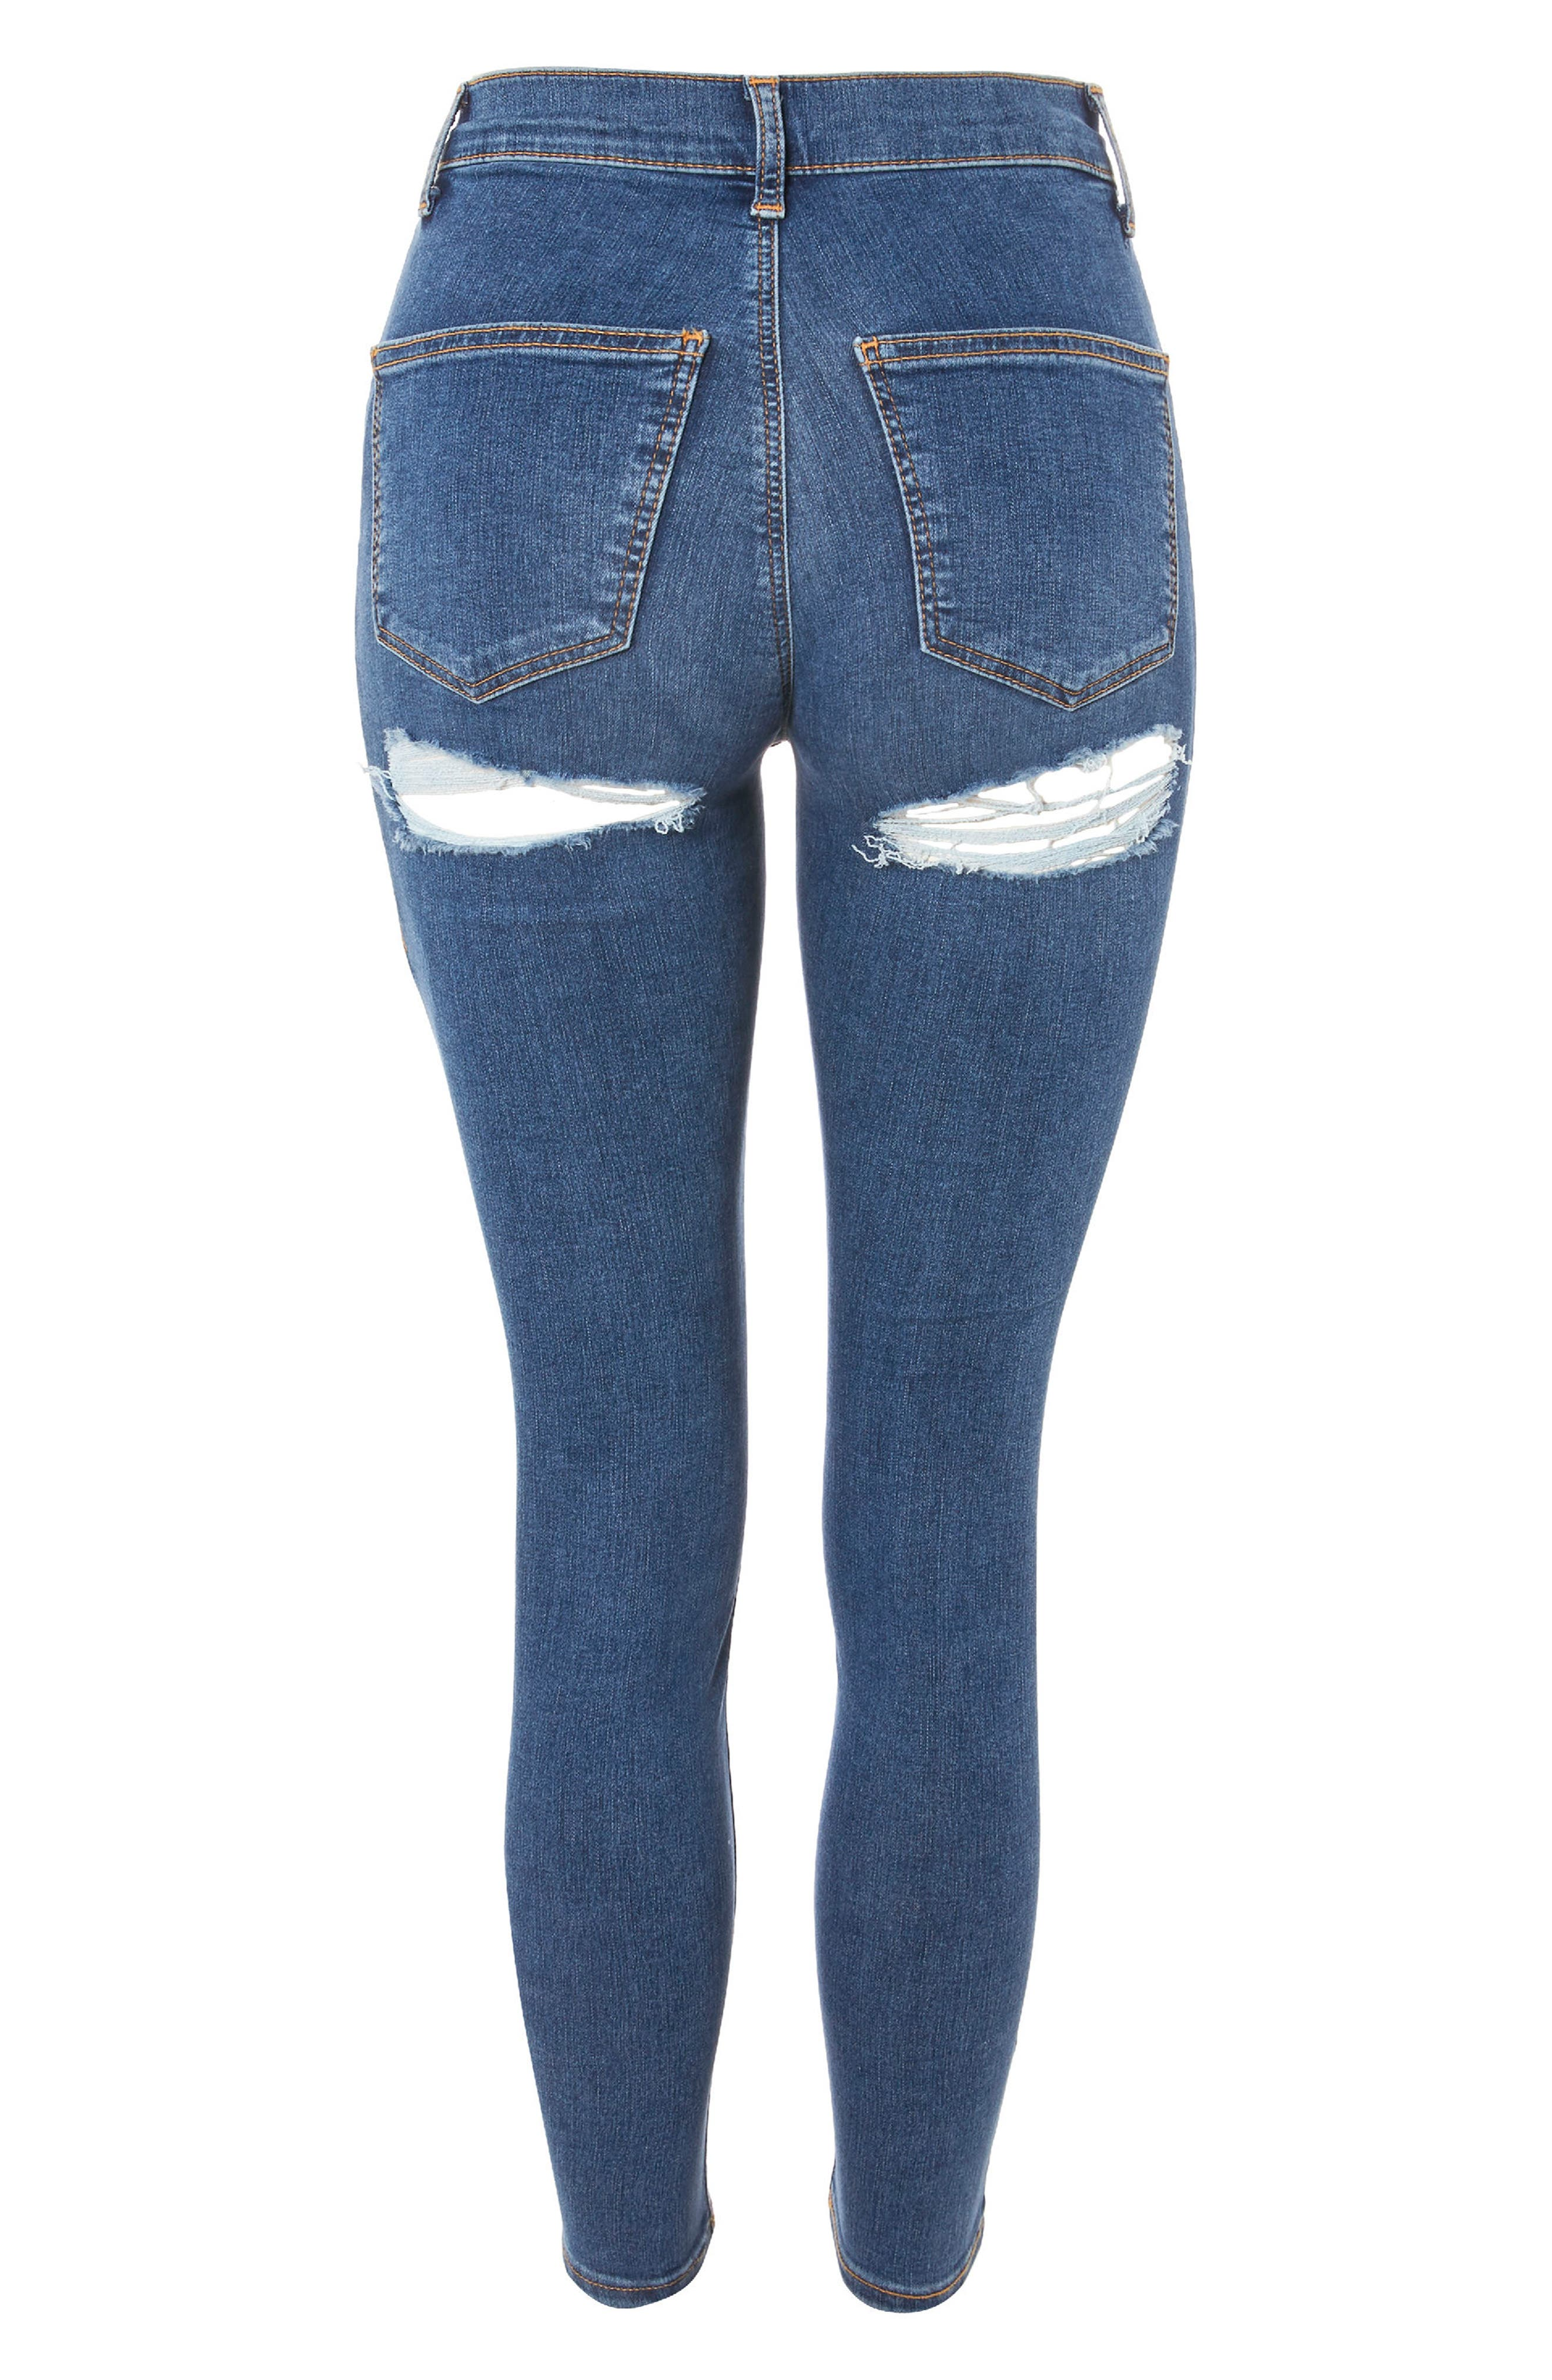 Joni Distressed Skinny Jeans,                             Alternate thumbnail 3, color,                             Mid Denim